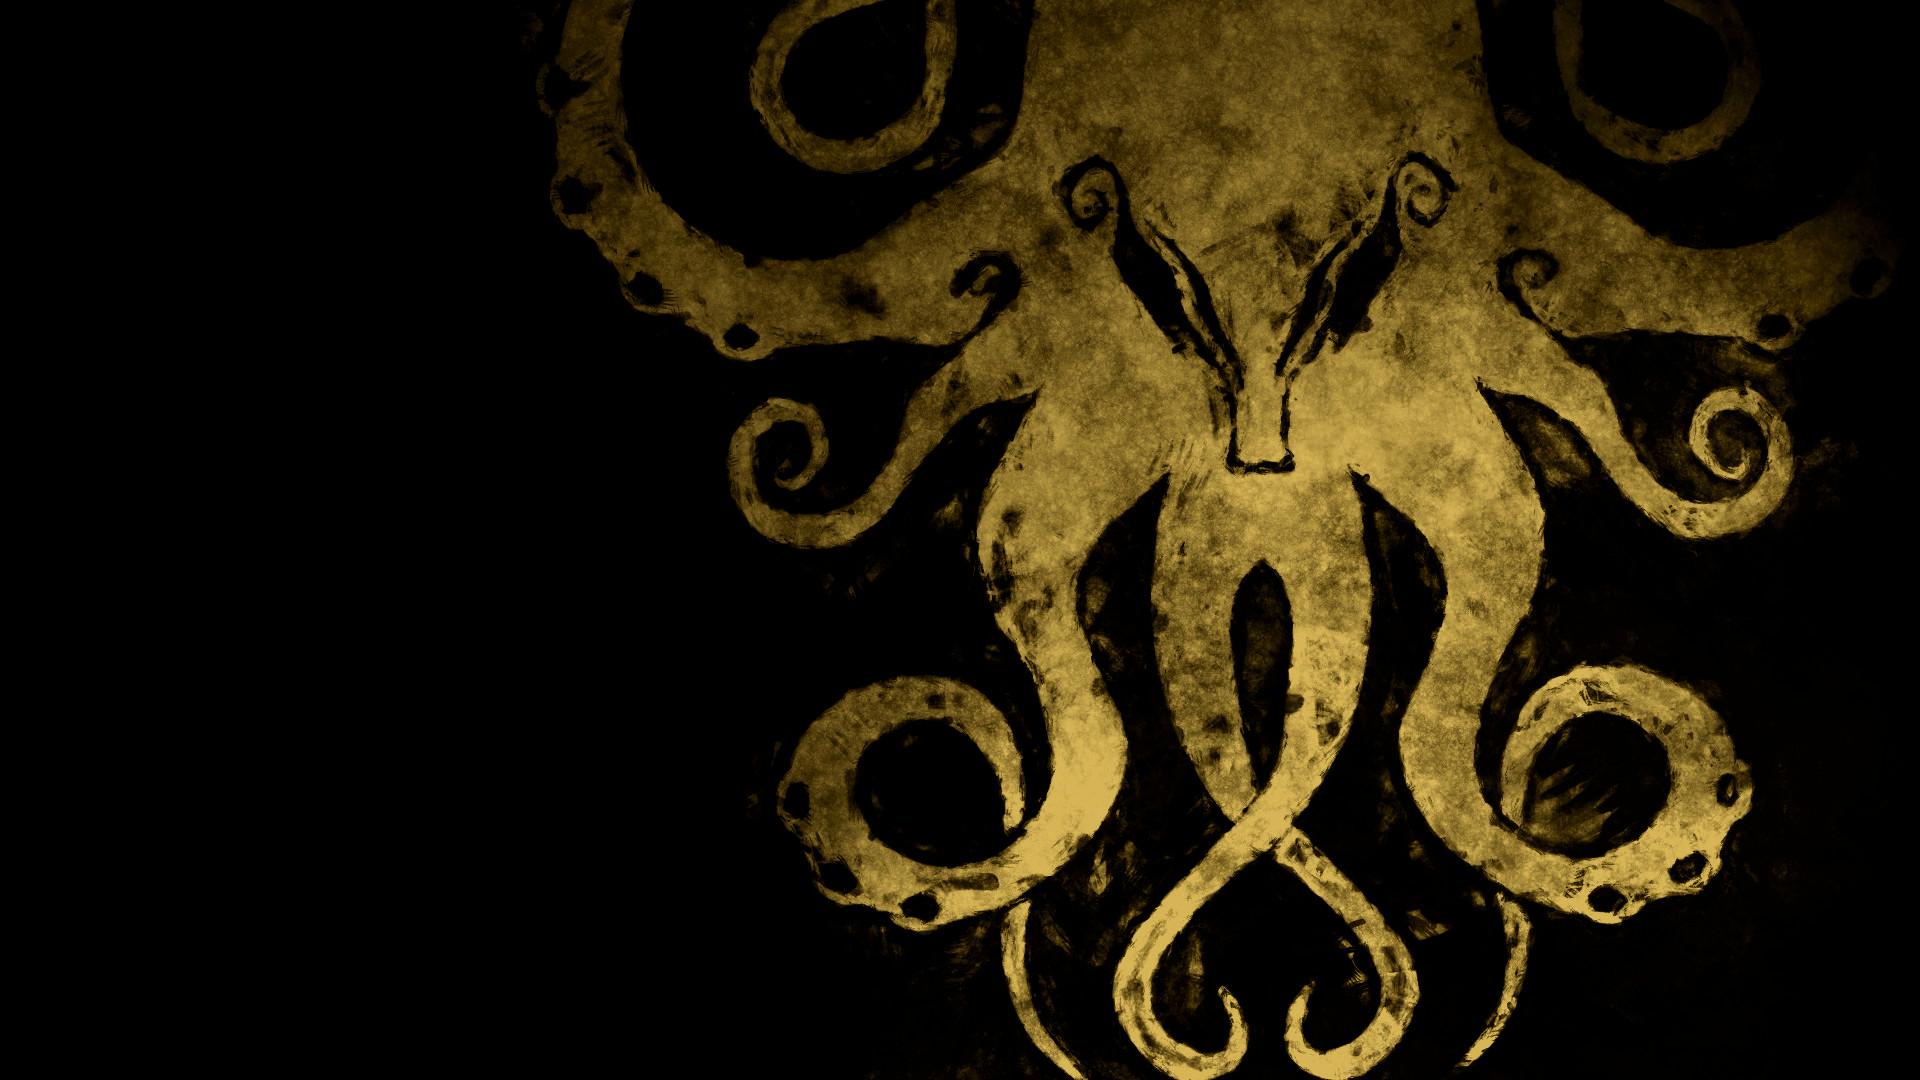 House Lannister Sigil Wallpaper. All …